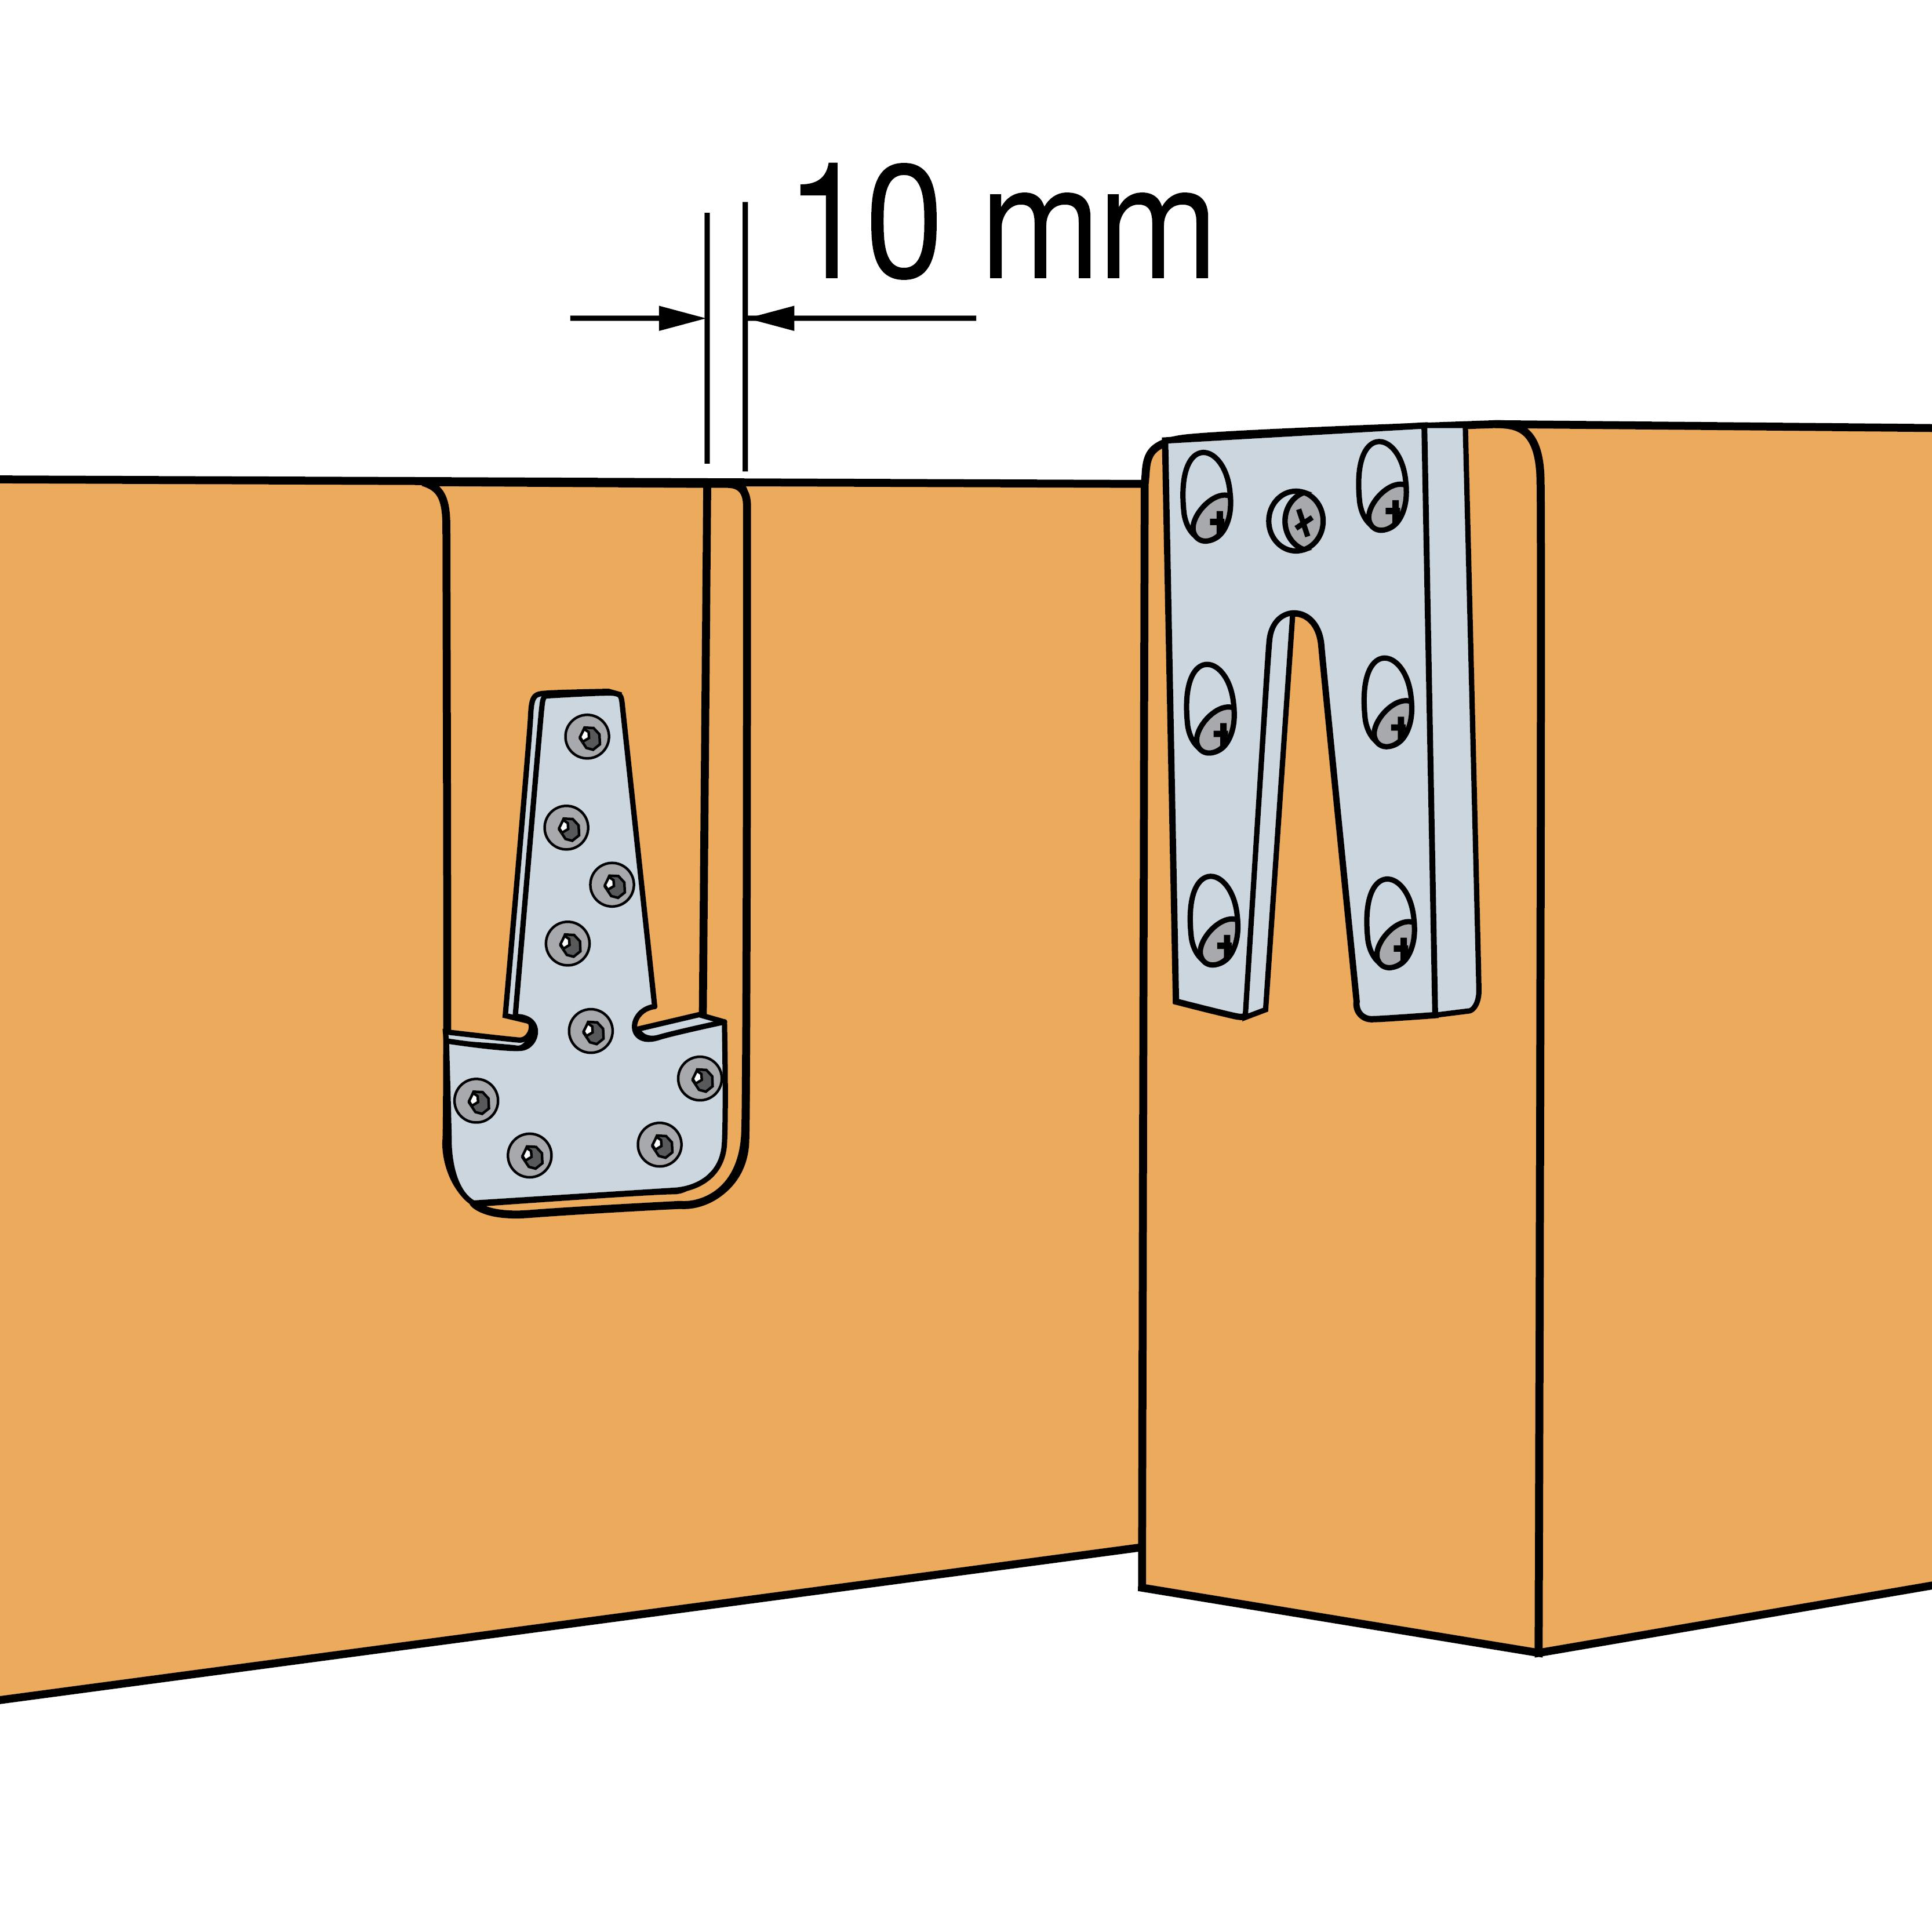 Hirnholzverbinder   ETB   Simpson Strong Tie